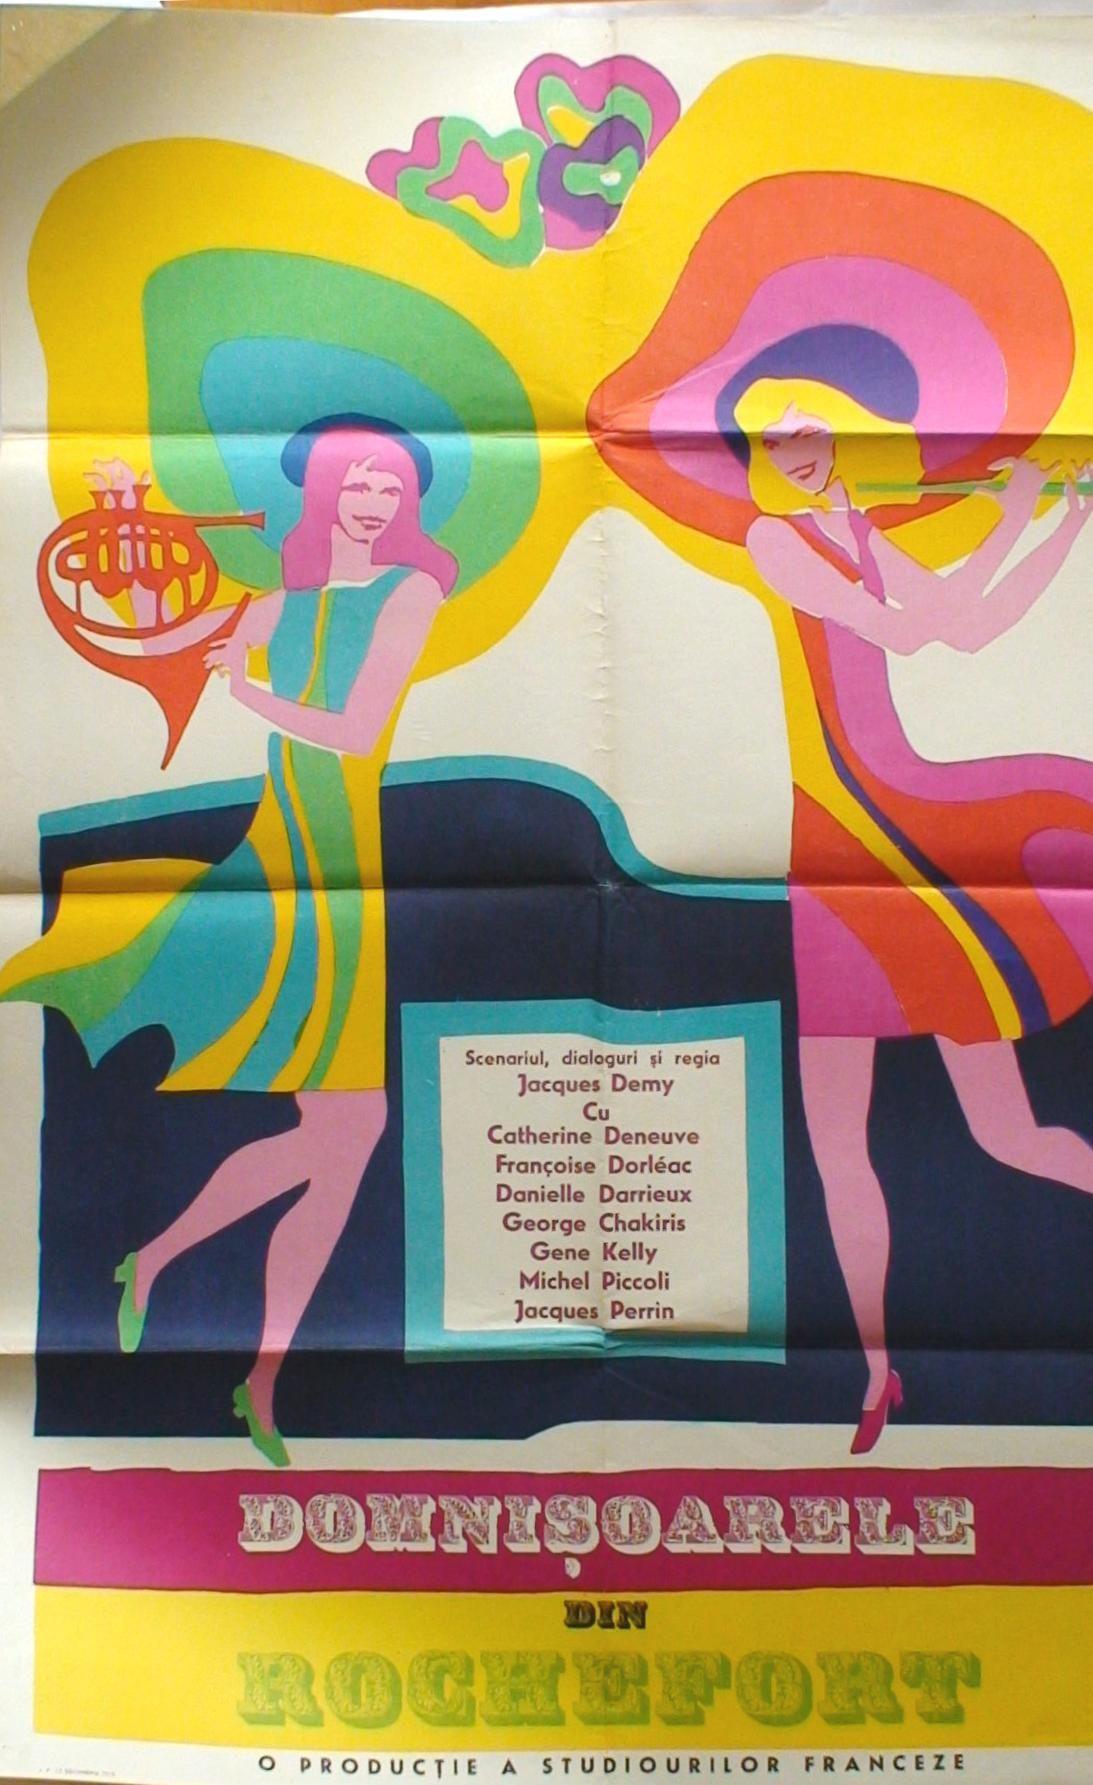 les demoiselles de rochefort poster romania 1967 jumelles rochefort pinterest. Black Bedroom Furniture Sets. Home Design Ideas